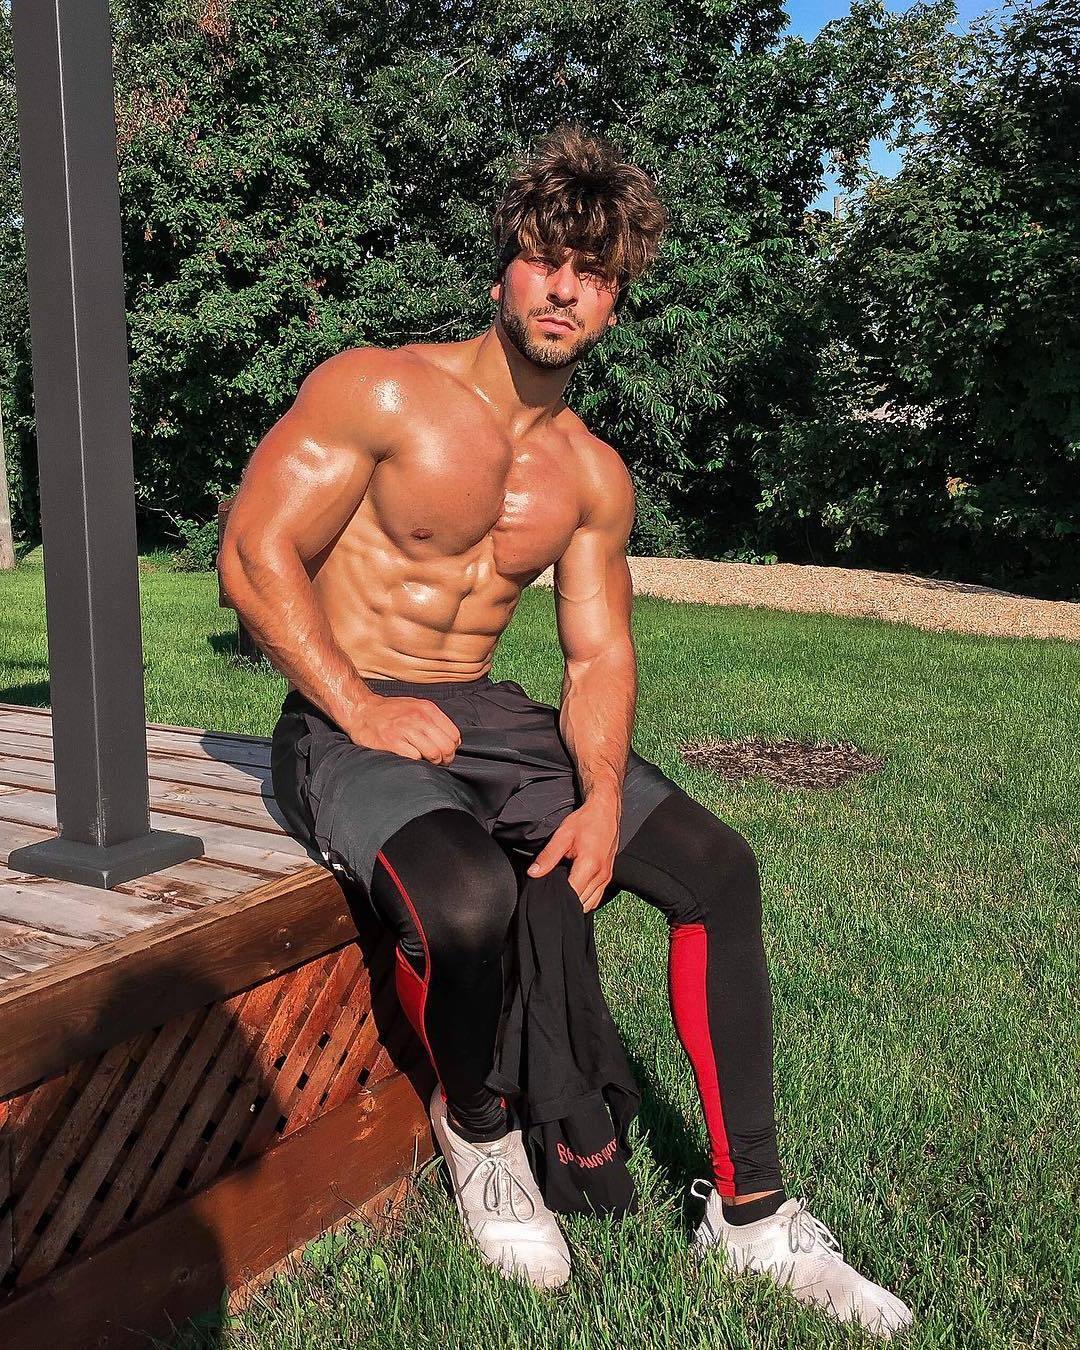 barechest-muscle-stud-joey-hornyak-pictures